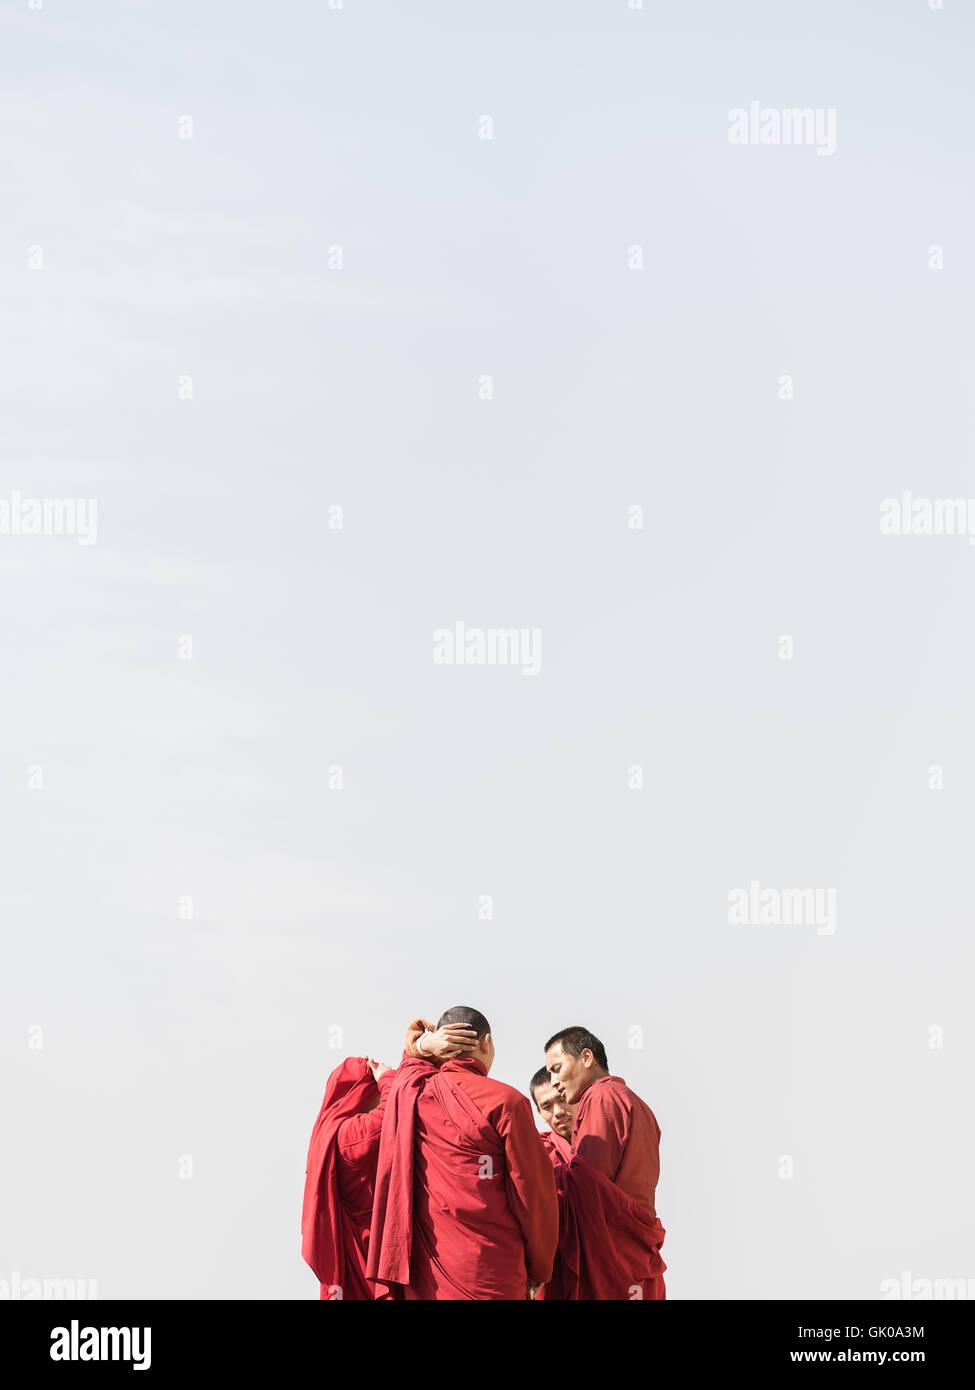 Monks converse in Lukla, Nepal - Stock Image